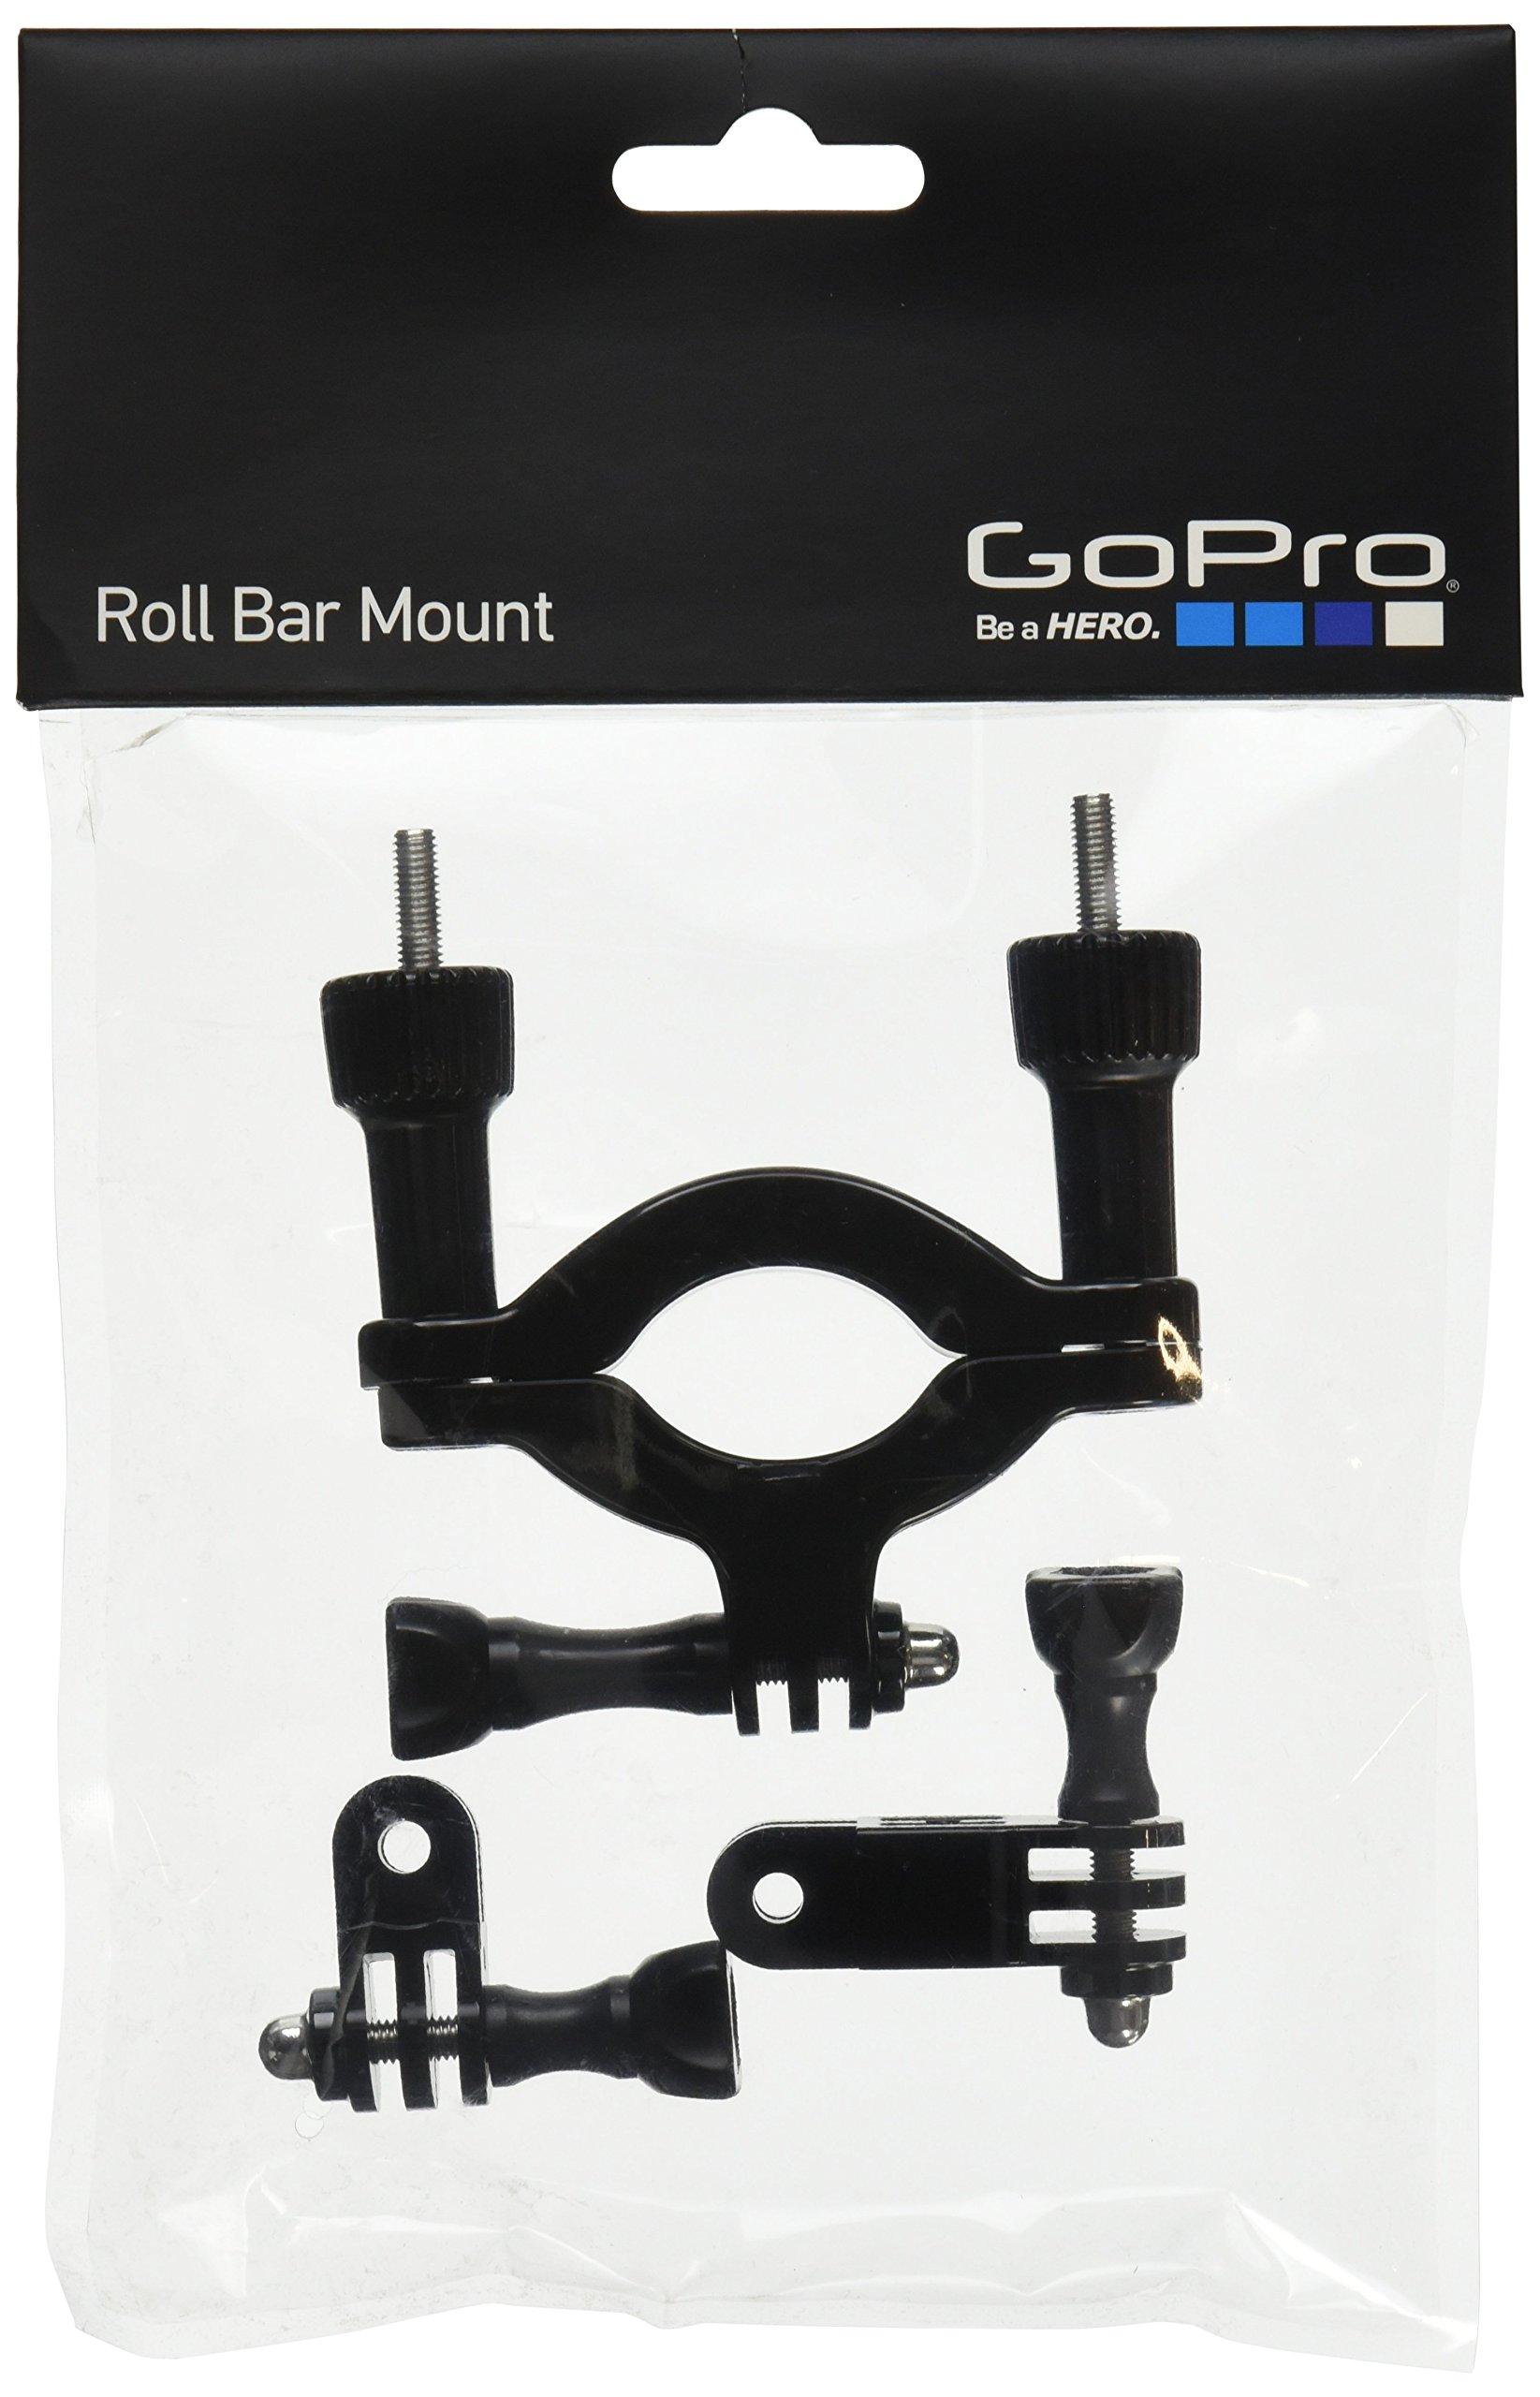 GoPro Roll Bar Mount